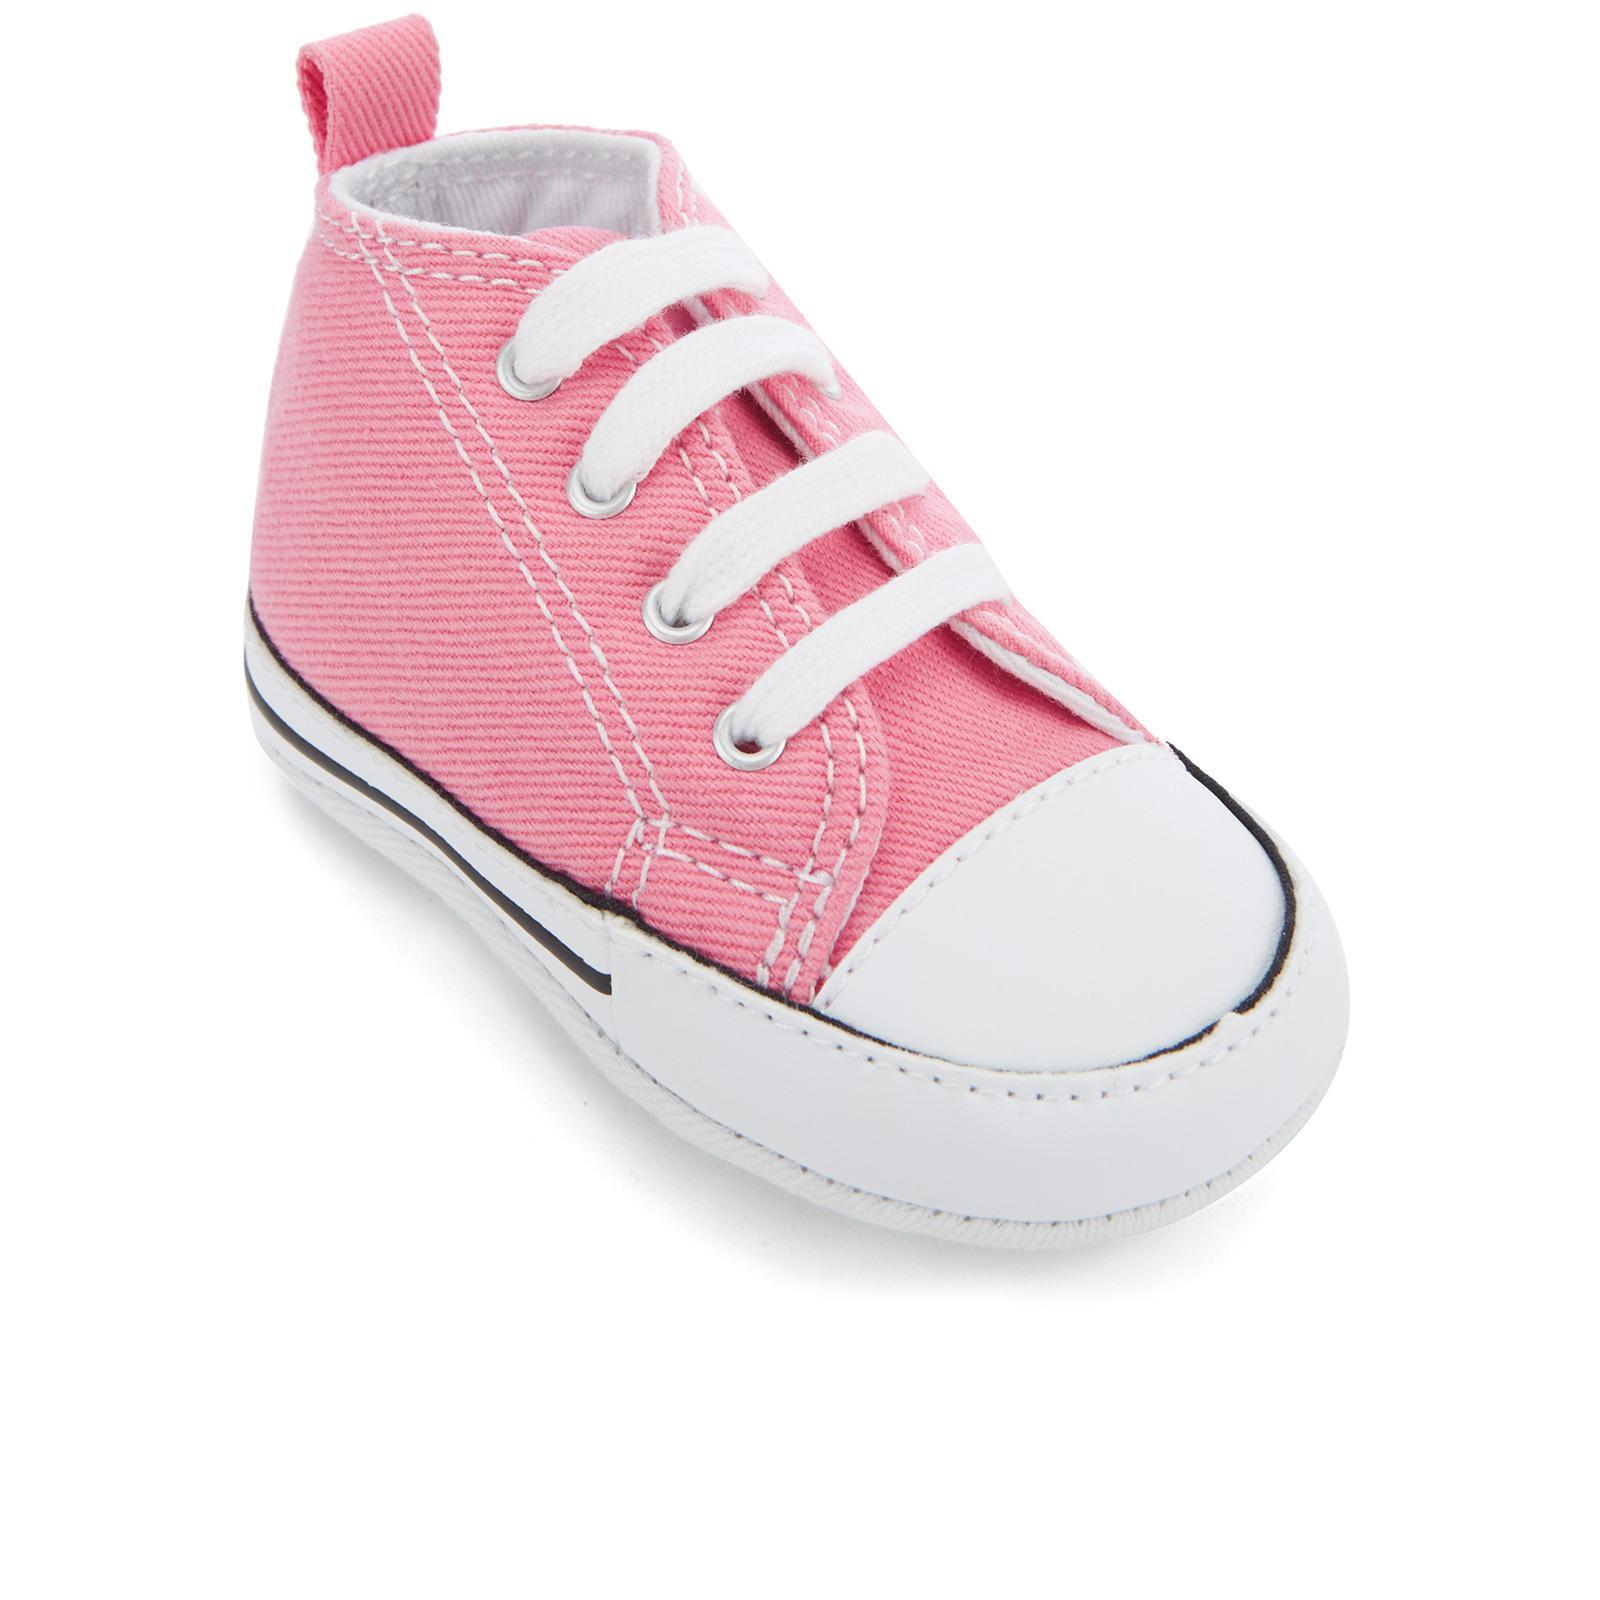 c29b494fe5d96b Converse - Pink Babies Chuck Taylor First Star Hi-top Trainers - Lyst. View  fullscreen